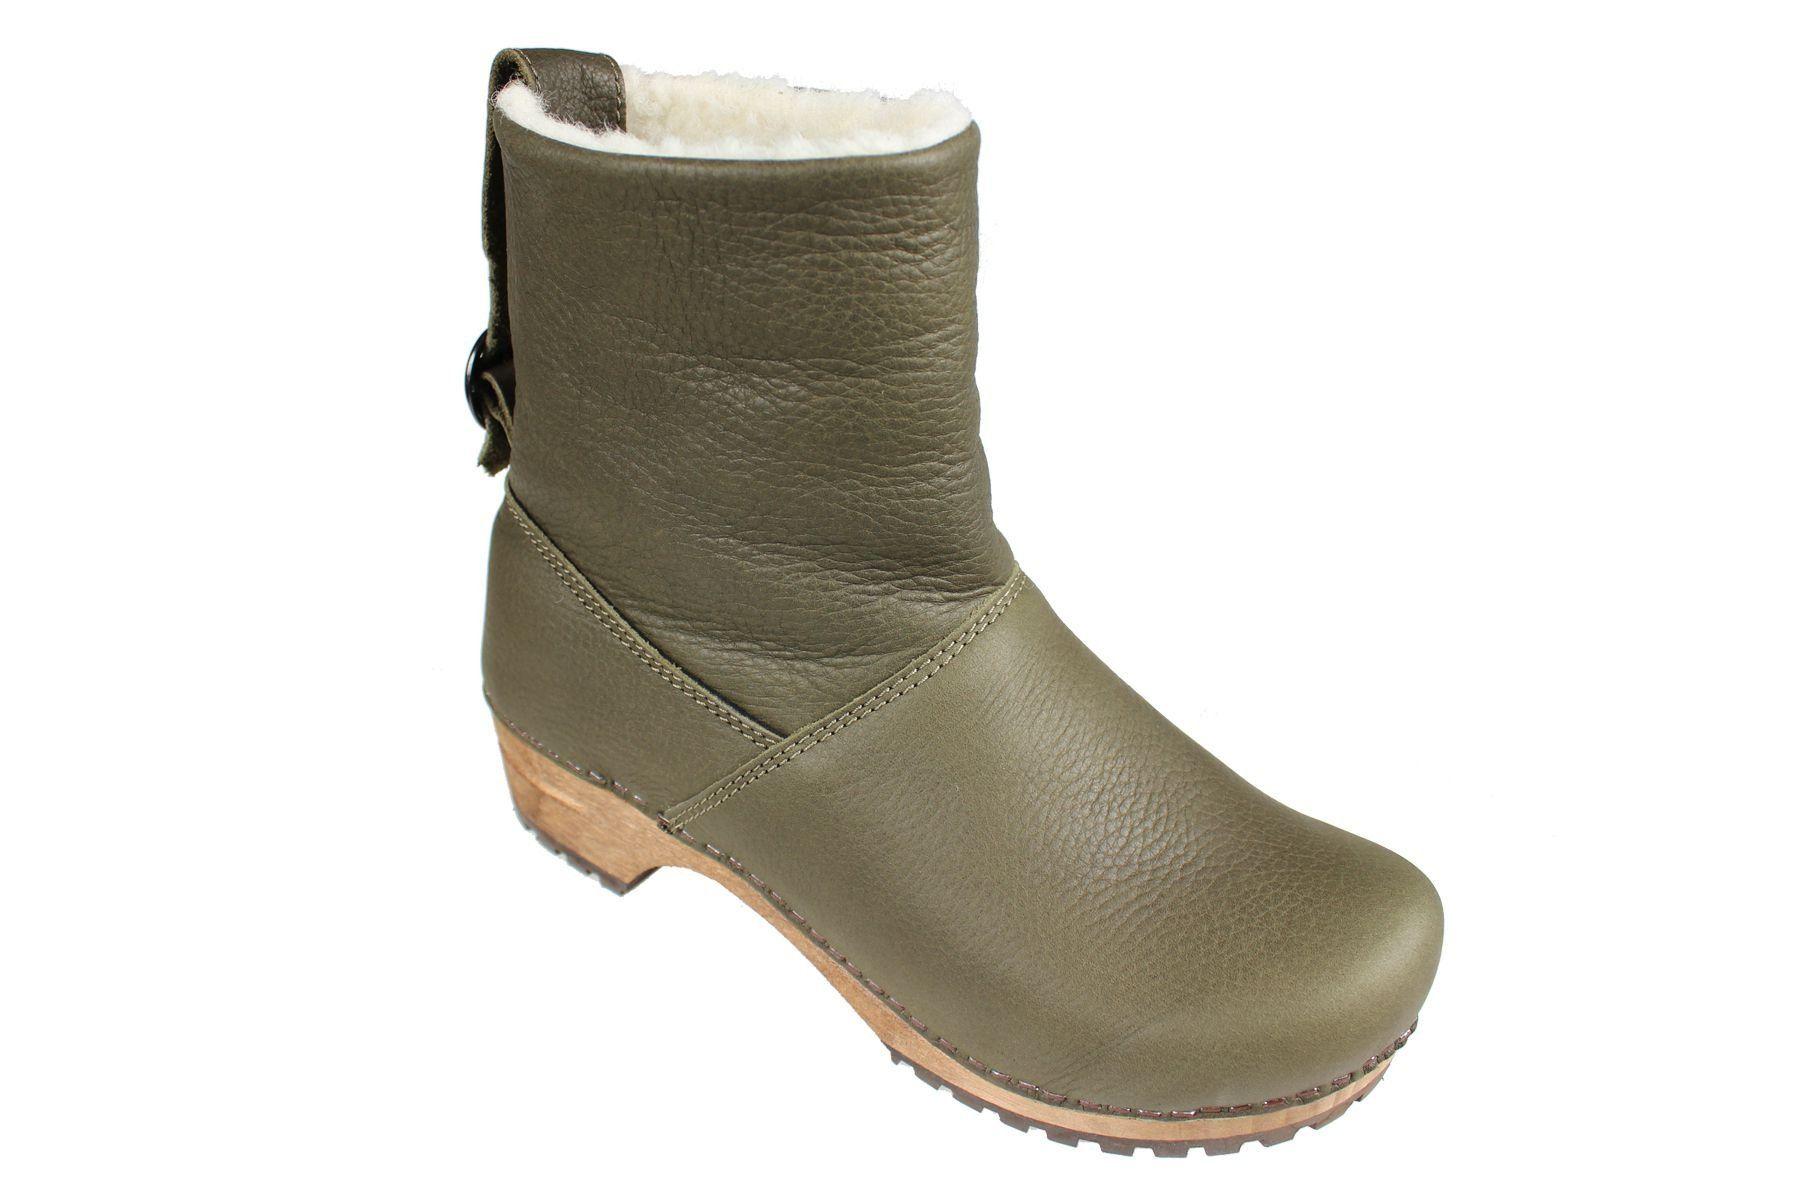 Sanita Silkan Wooden Clog Boot in Yak Waxy Nubuck Olive